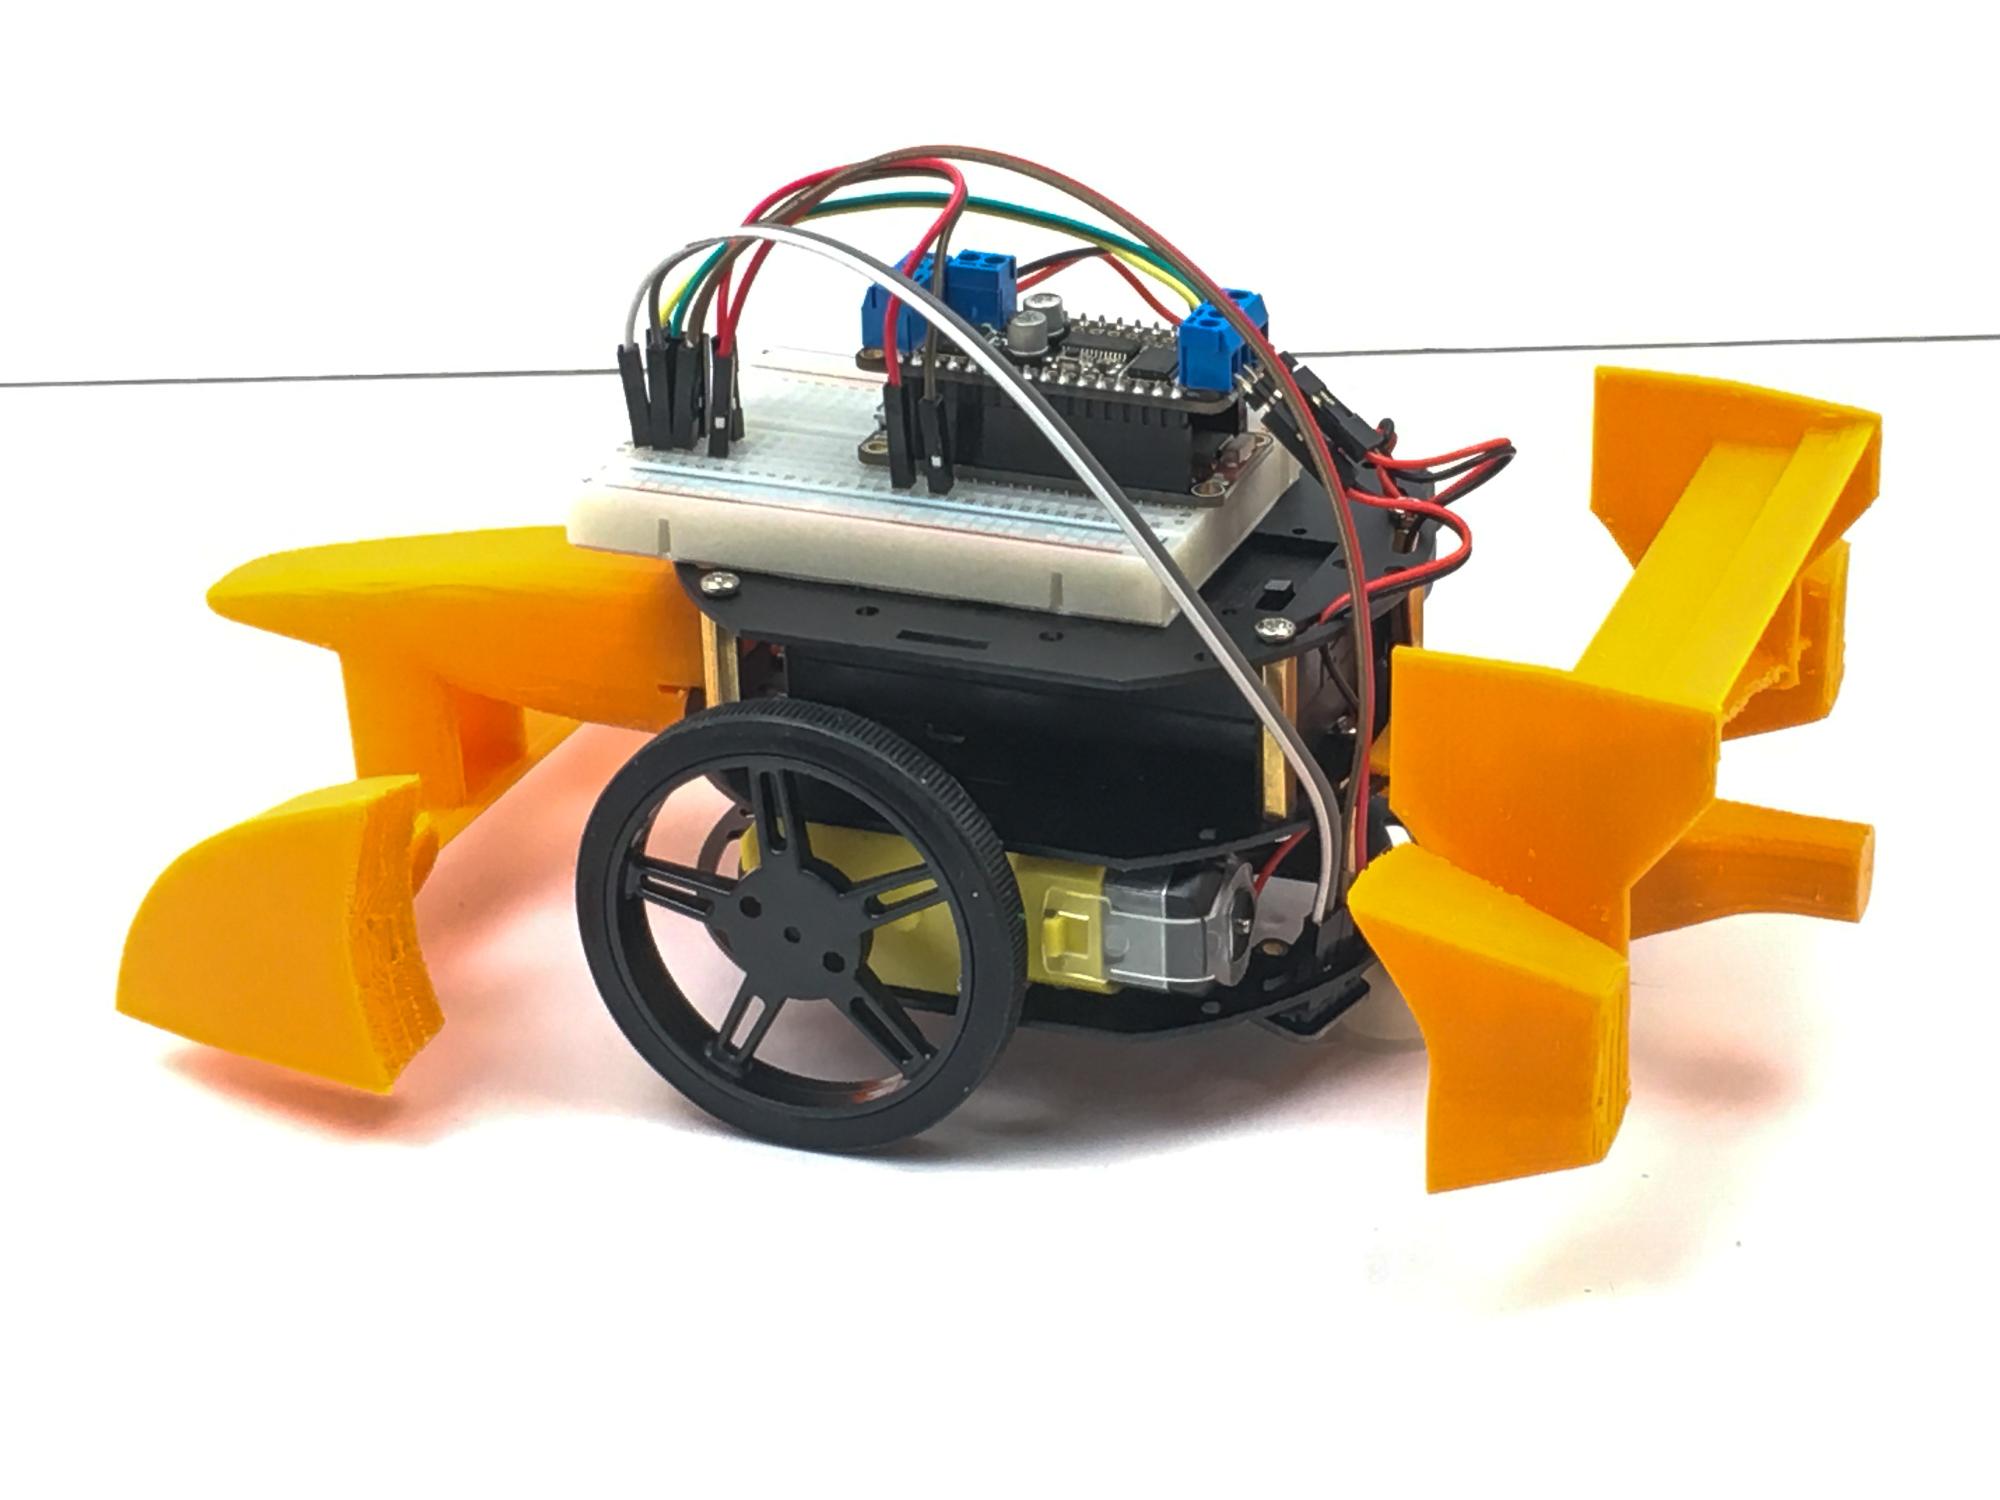 robotics_IMG_0087_2k.jpg